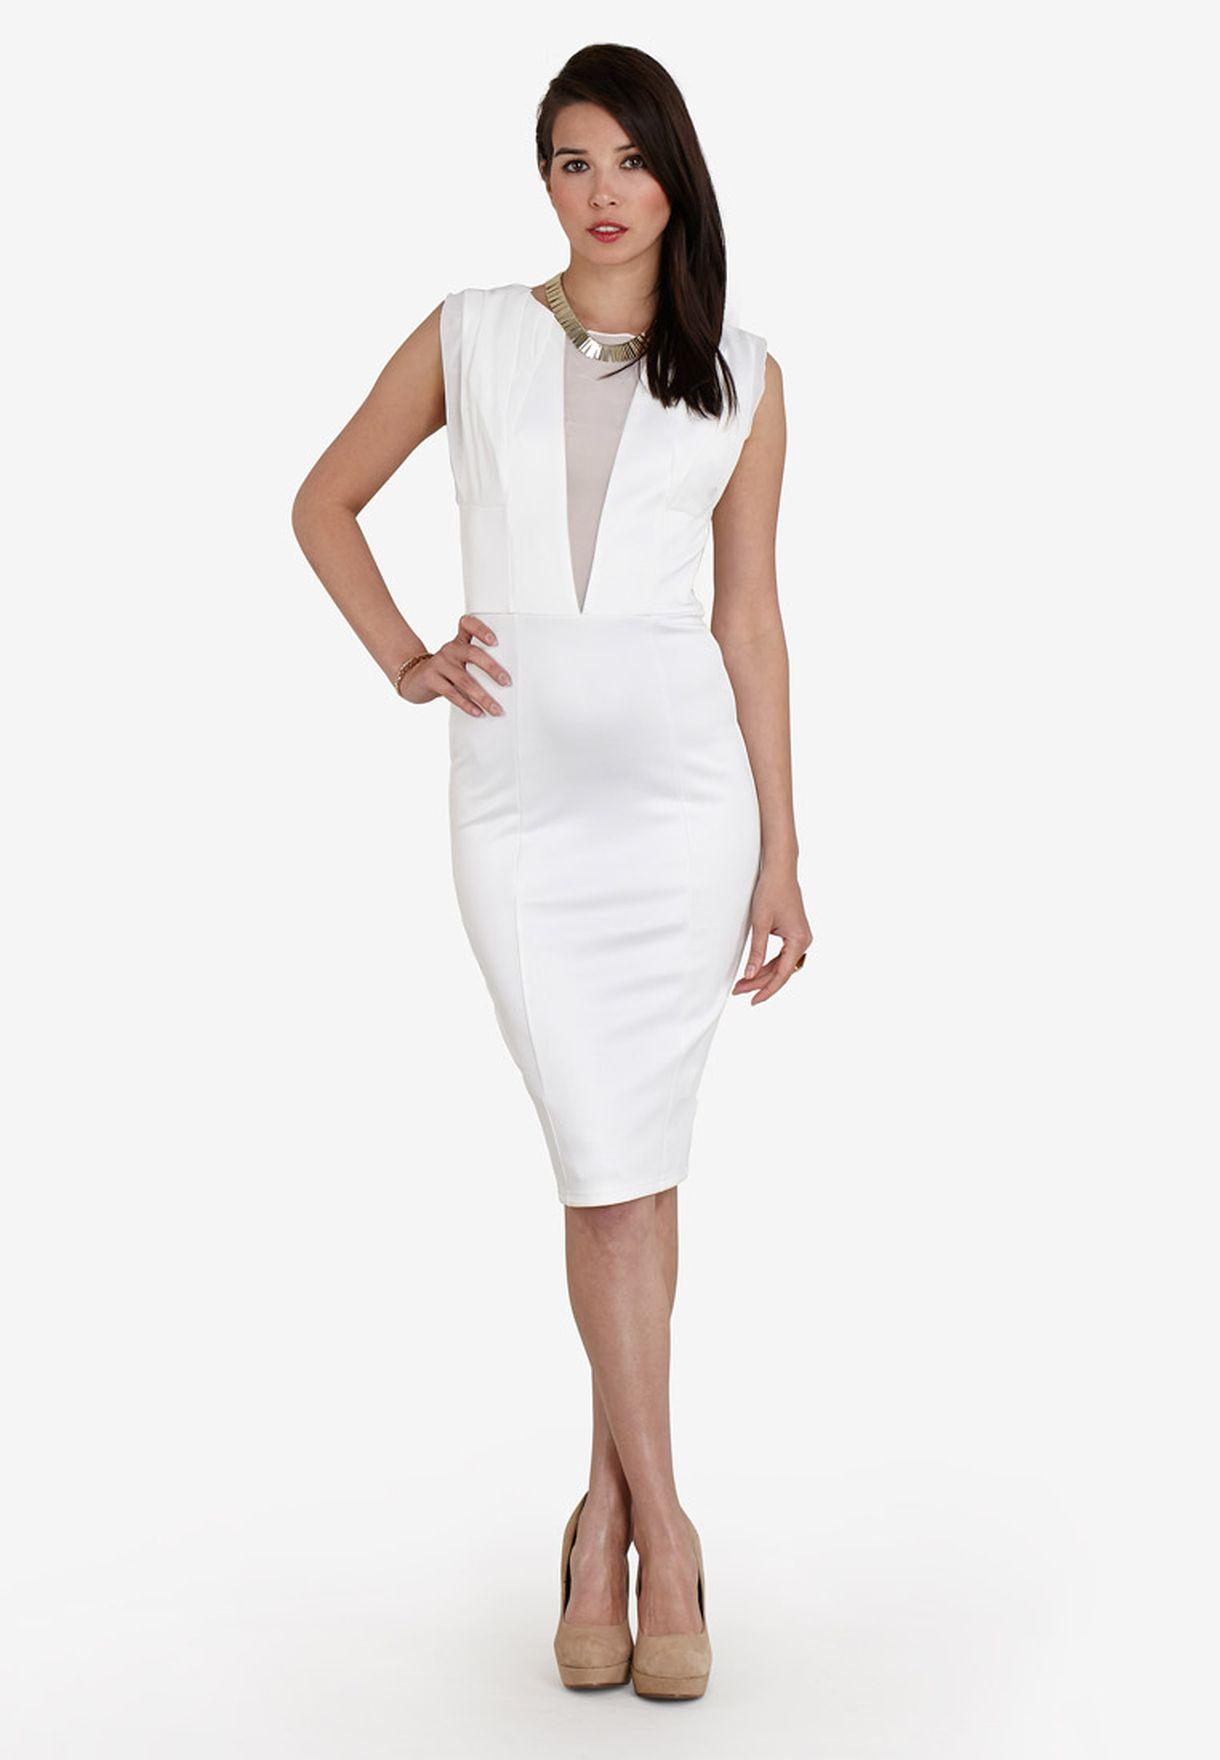 c1d6bf0e72e4b Shop Ax paris white Mesh Front Midi Dress for Women in Oman ...